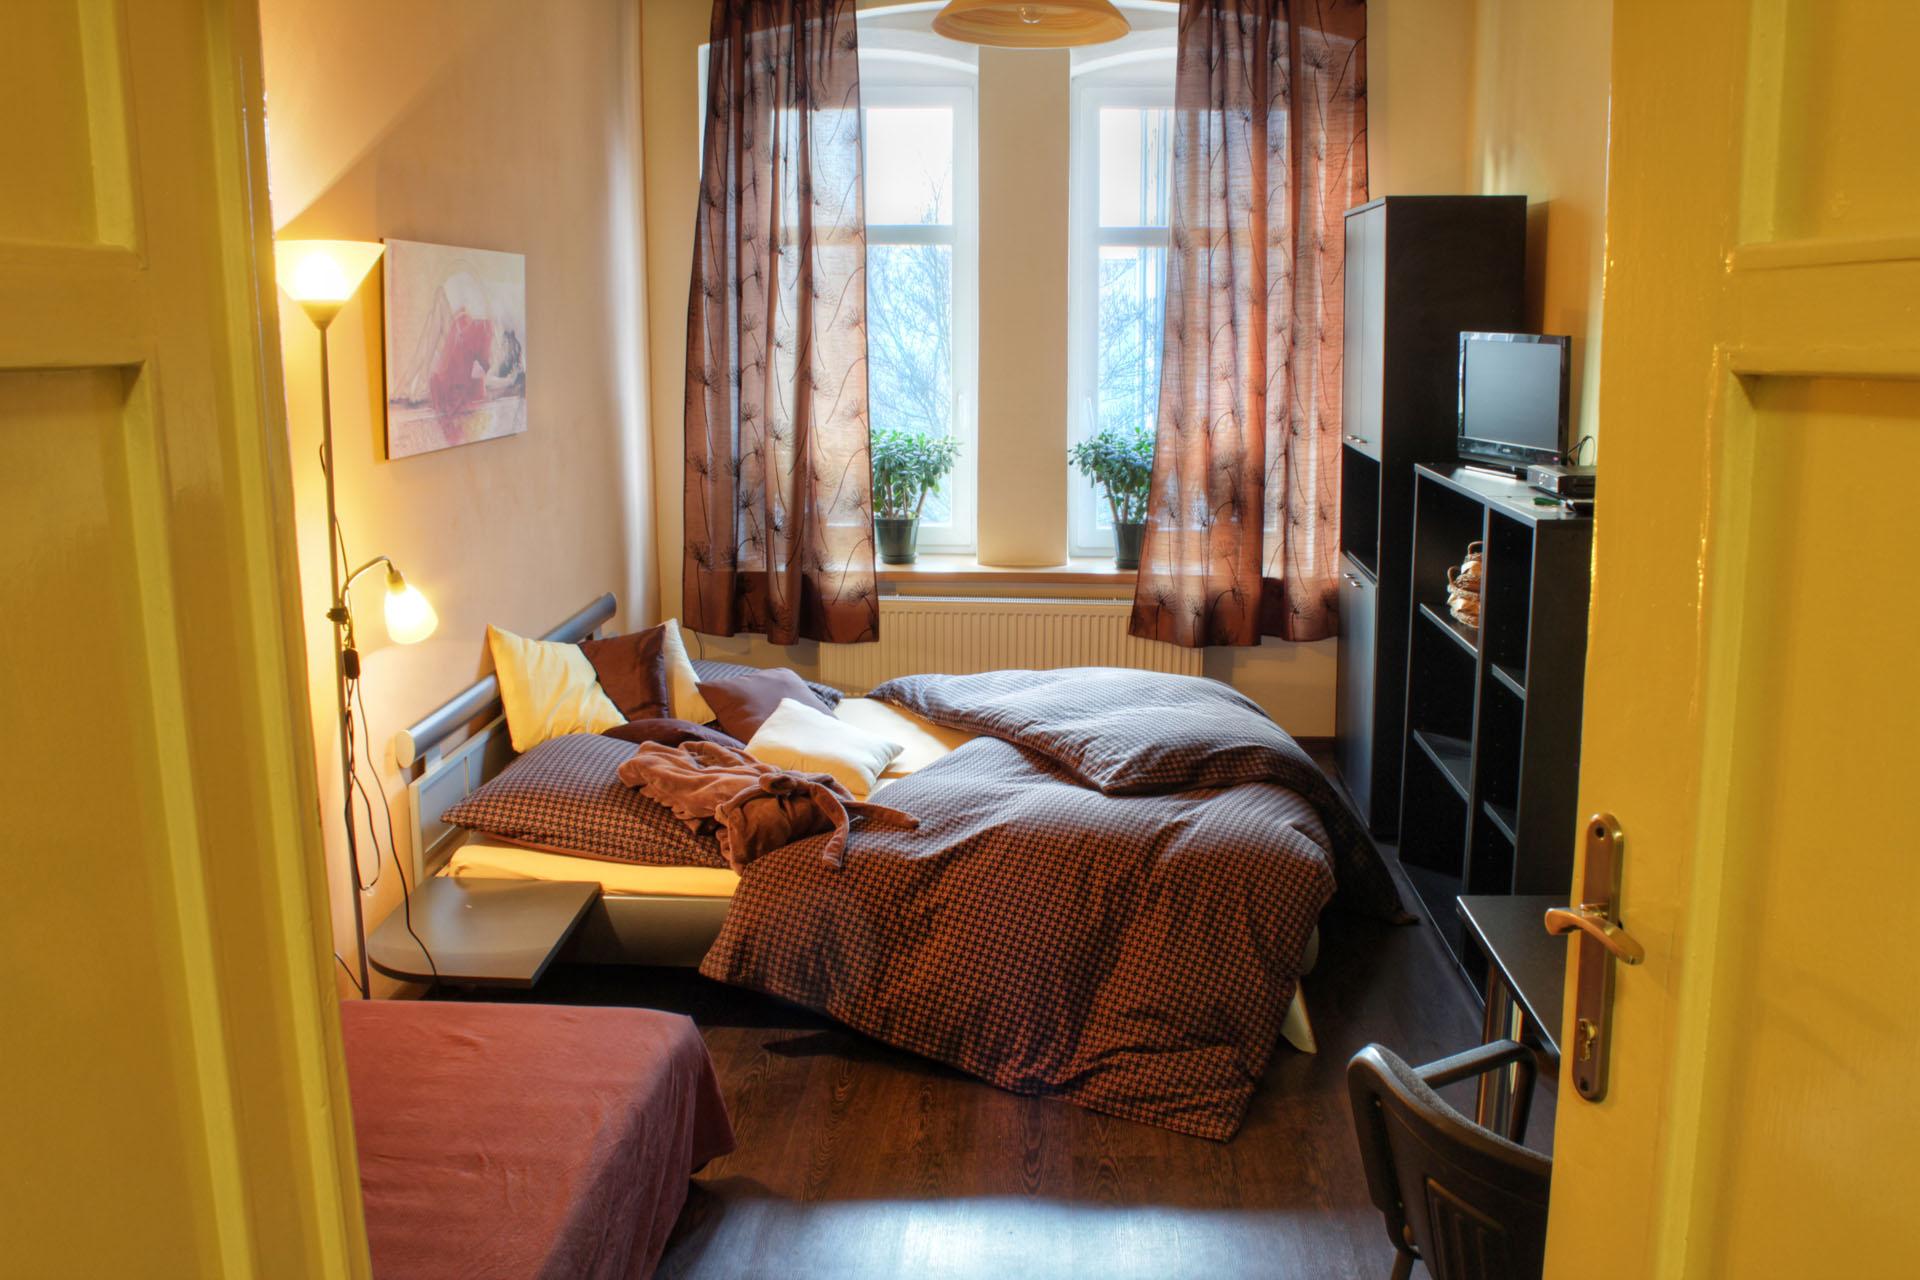 Manželská postel a válenda, úložné prostory, pracovní stůl, obraz Talantbeka Chekirova v apartmánu Sidonie